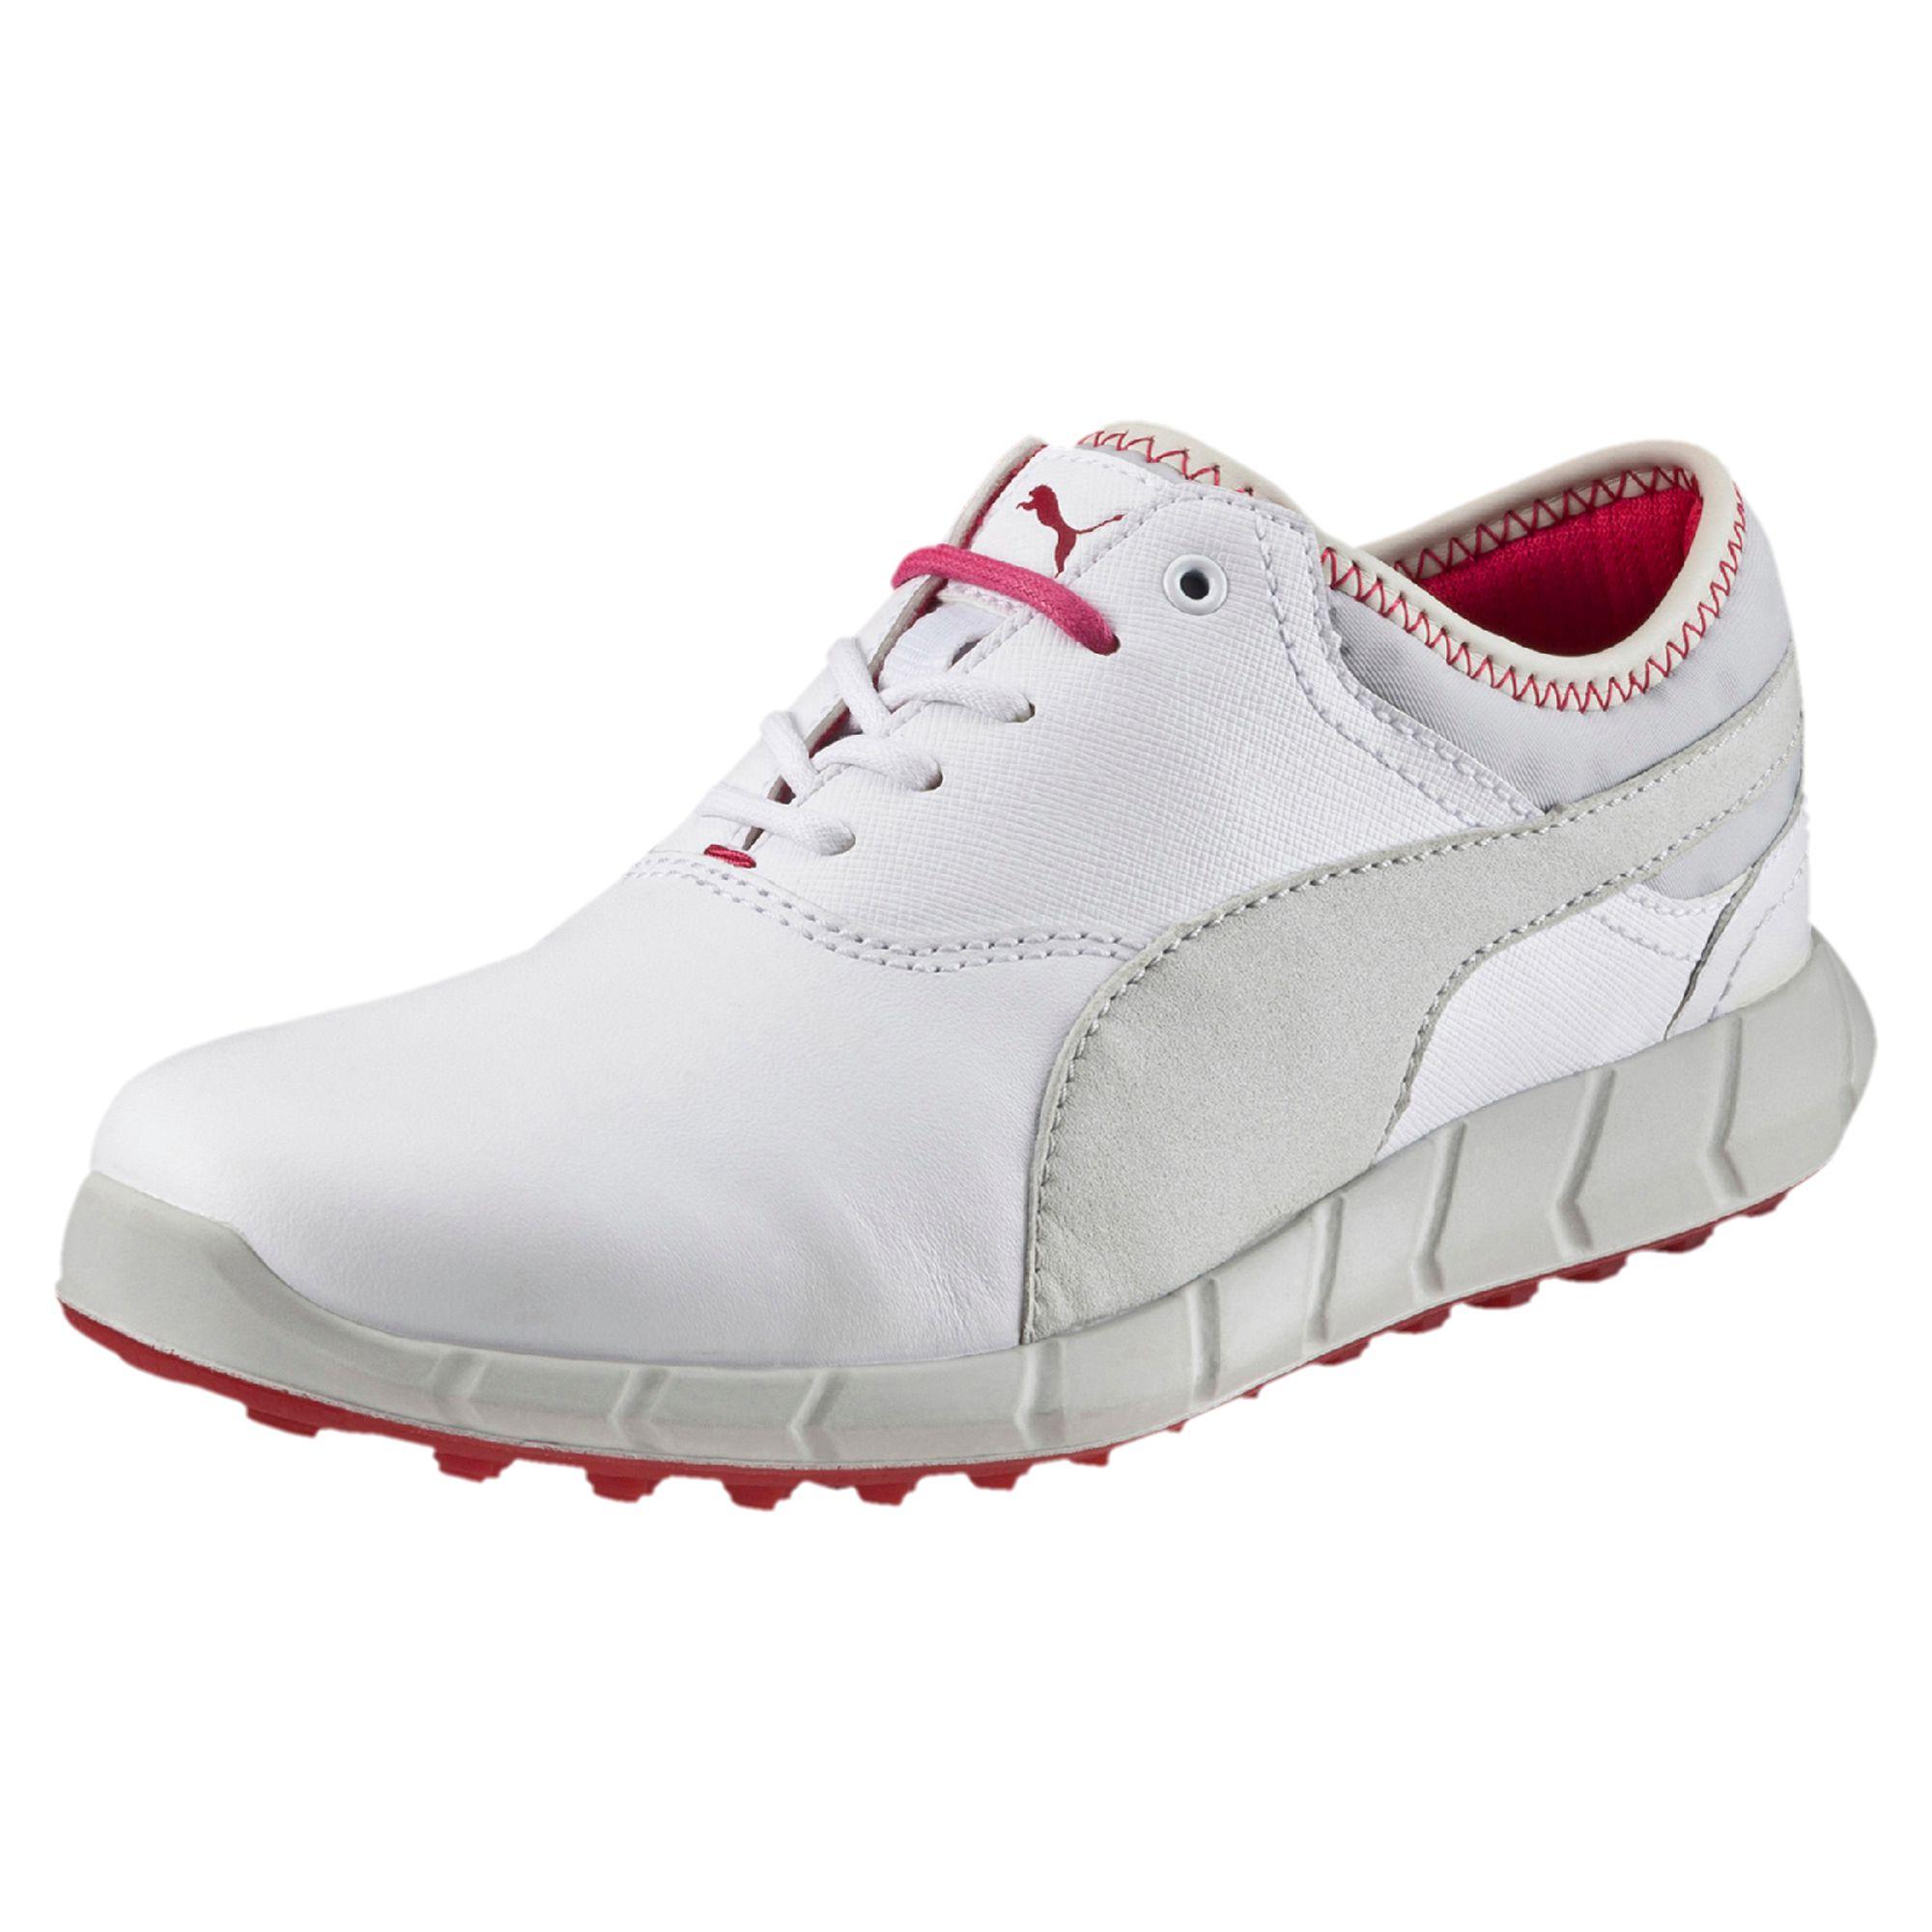 IGNITE Spikeless дамы обуви для гольфа